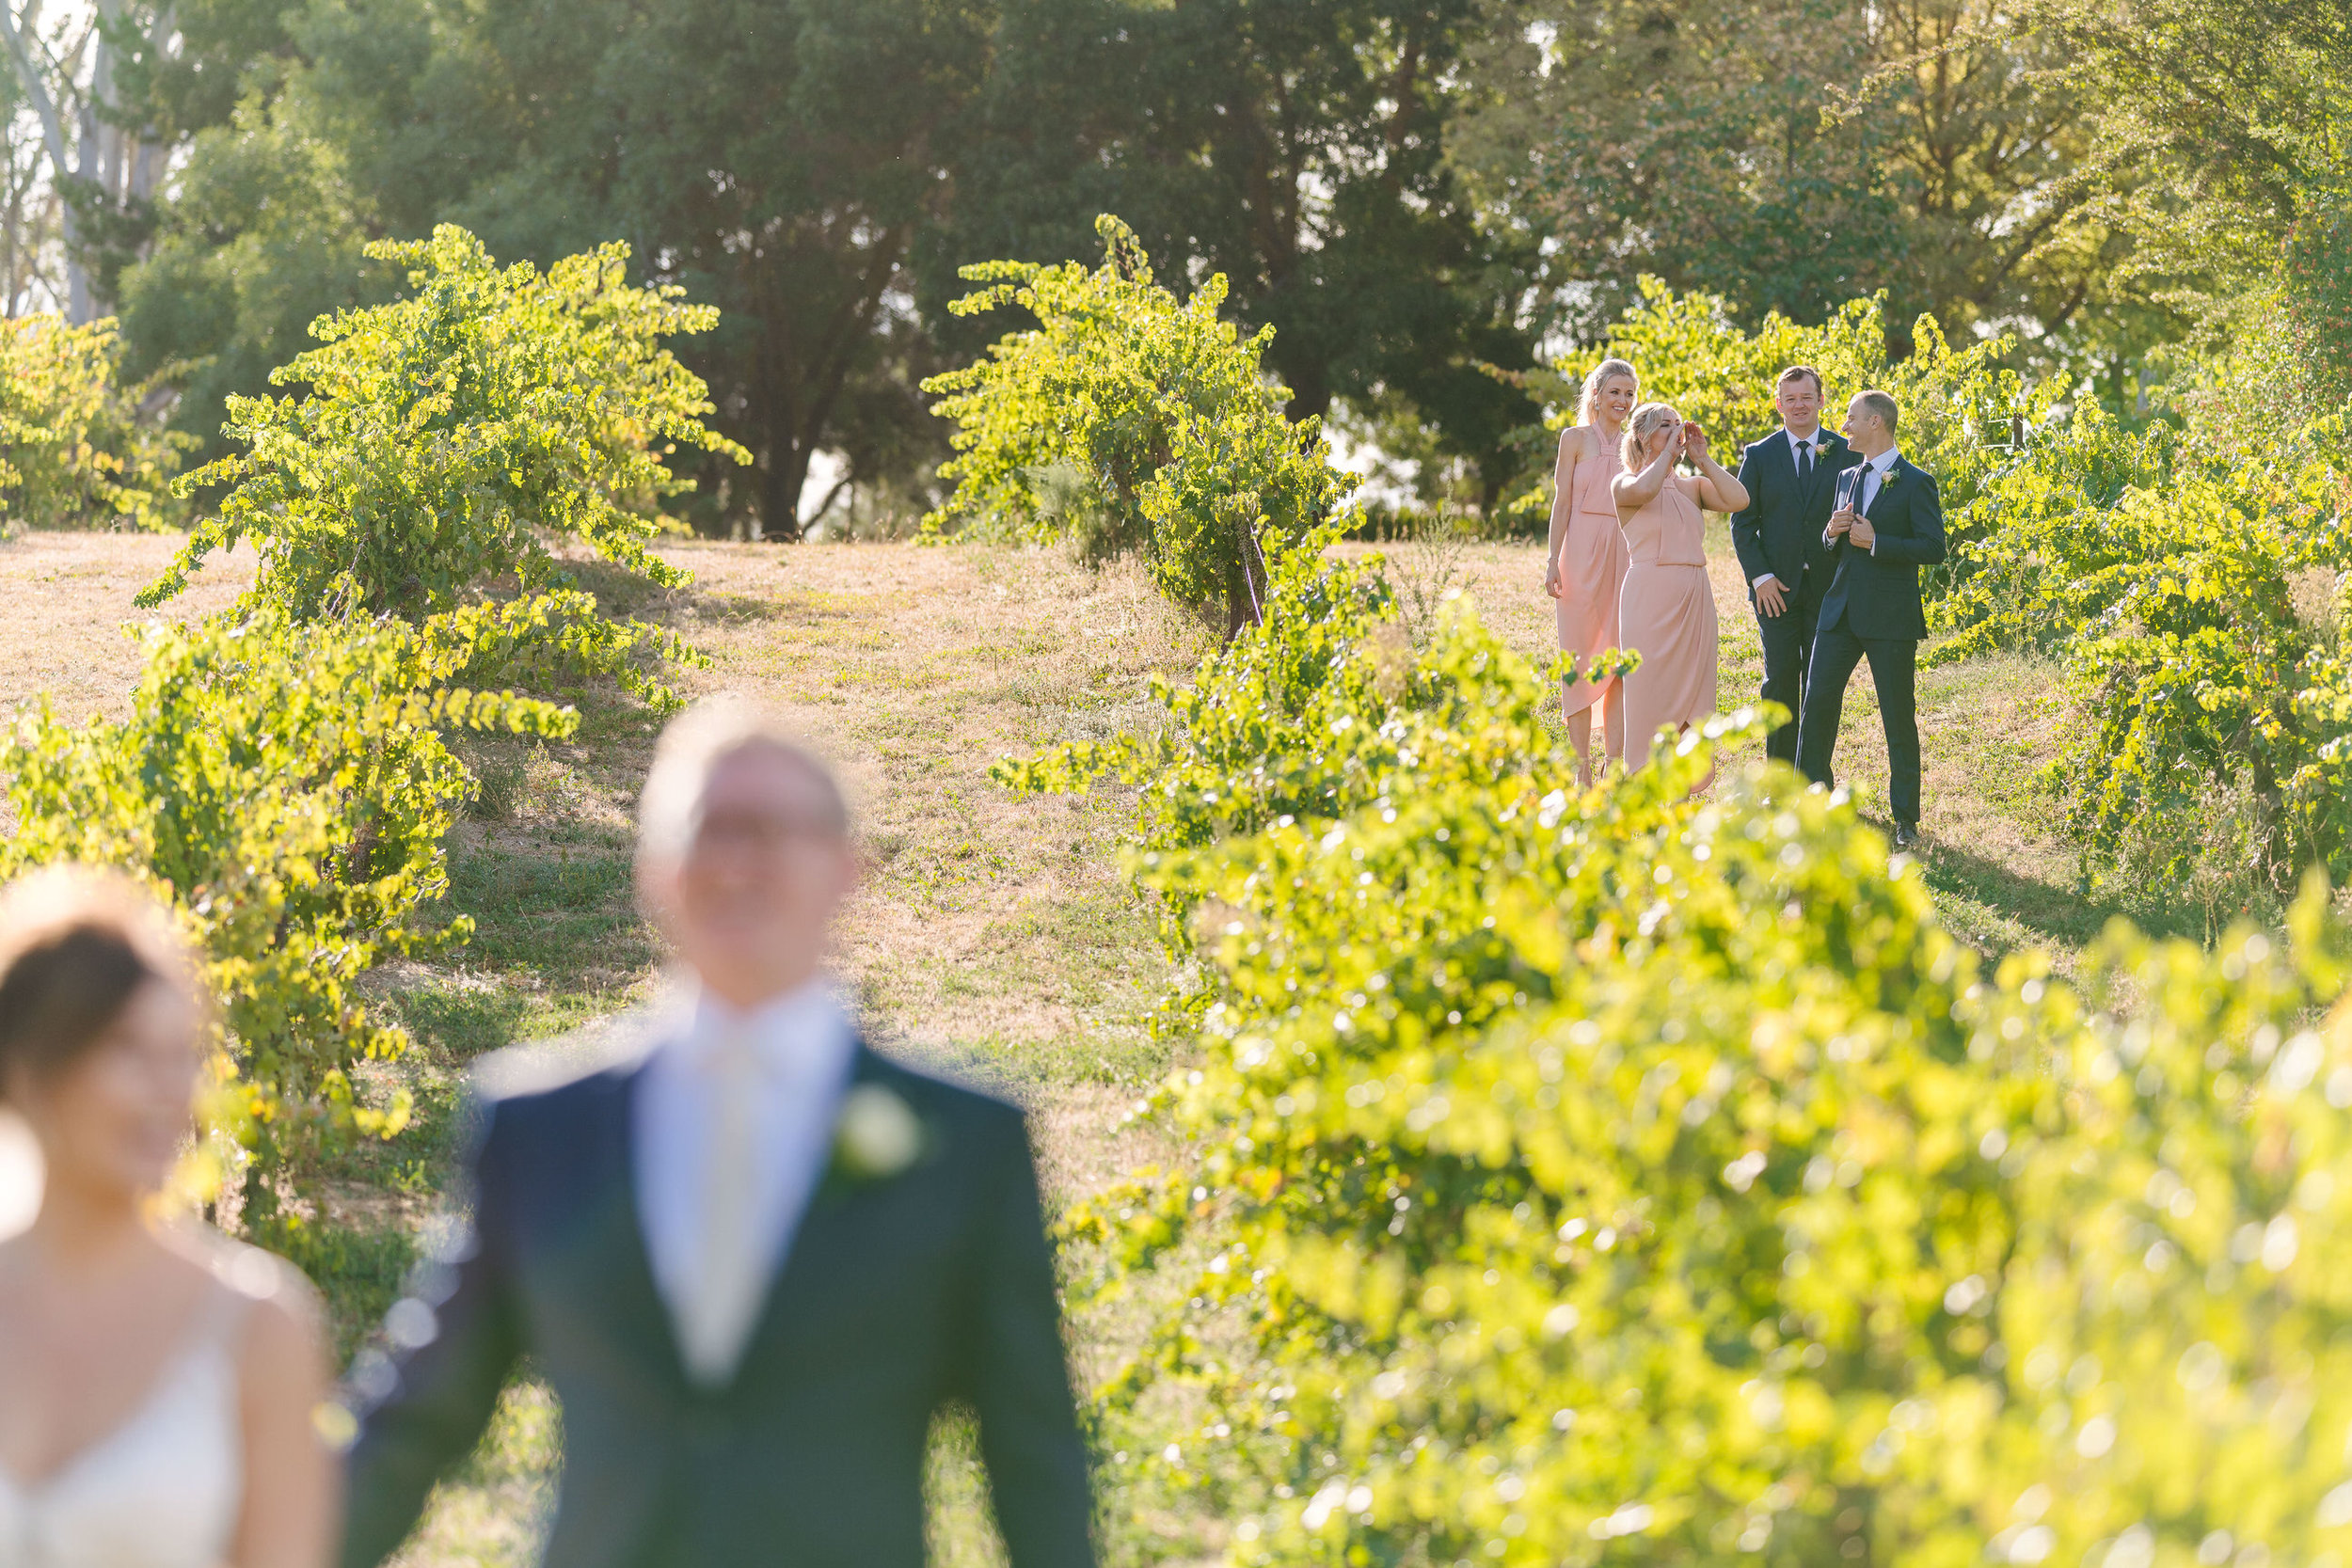 Justin_And_Jim_Photography_Chateau_Dore_Bendigo_Wedding66.JPG